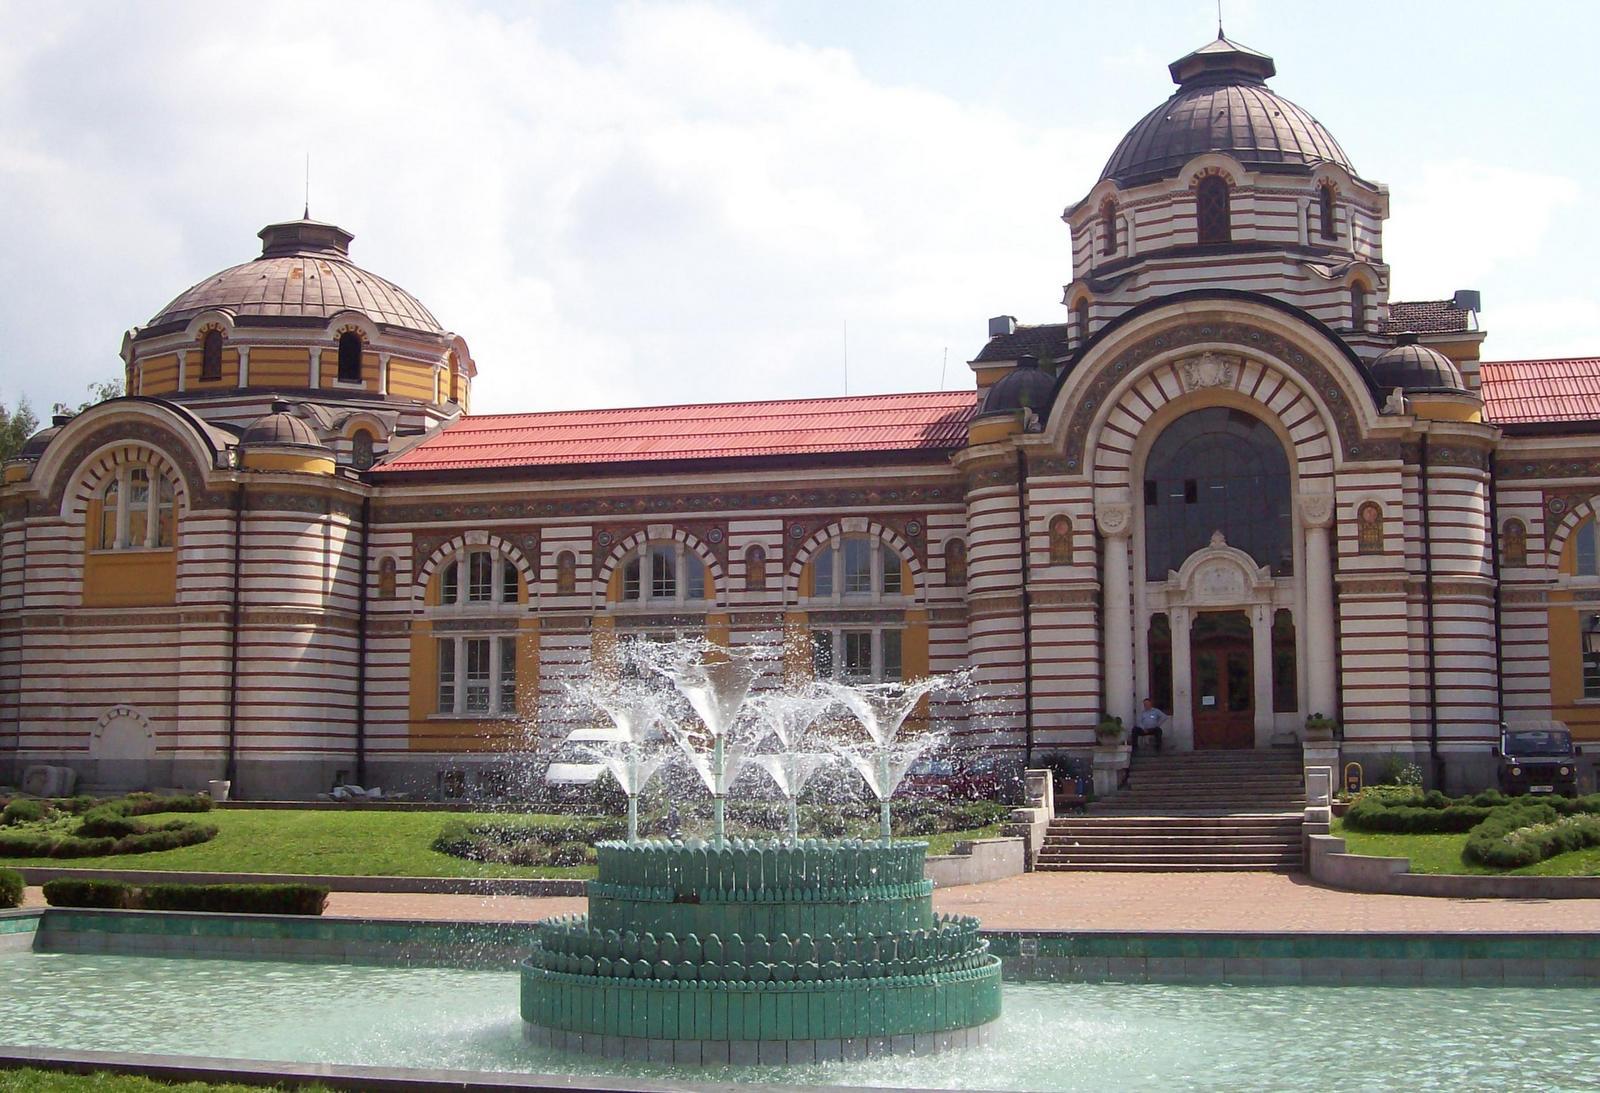 Mineral-Badehaus Sofia